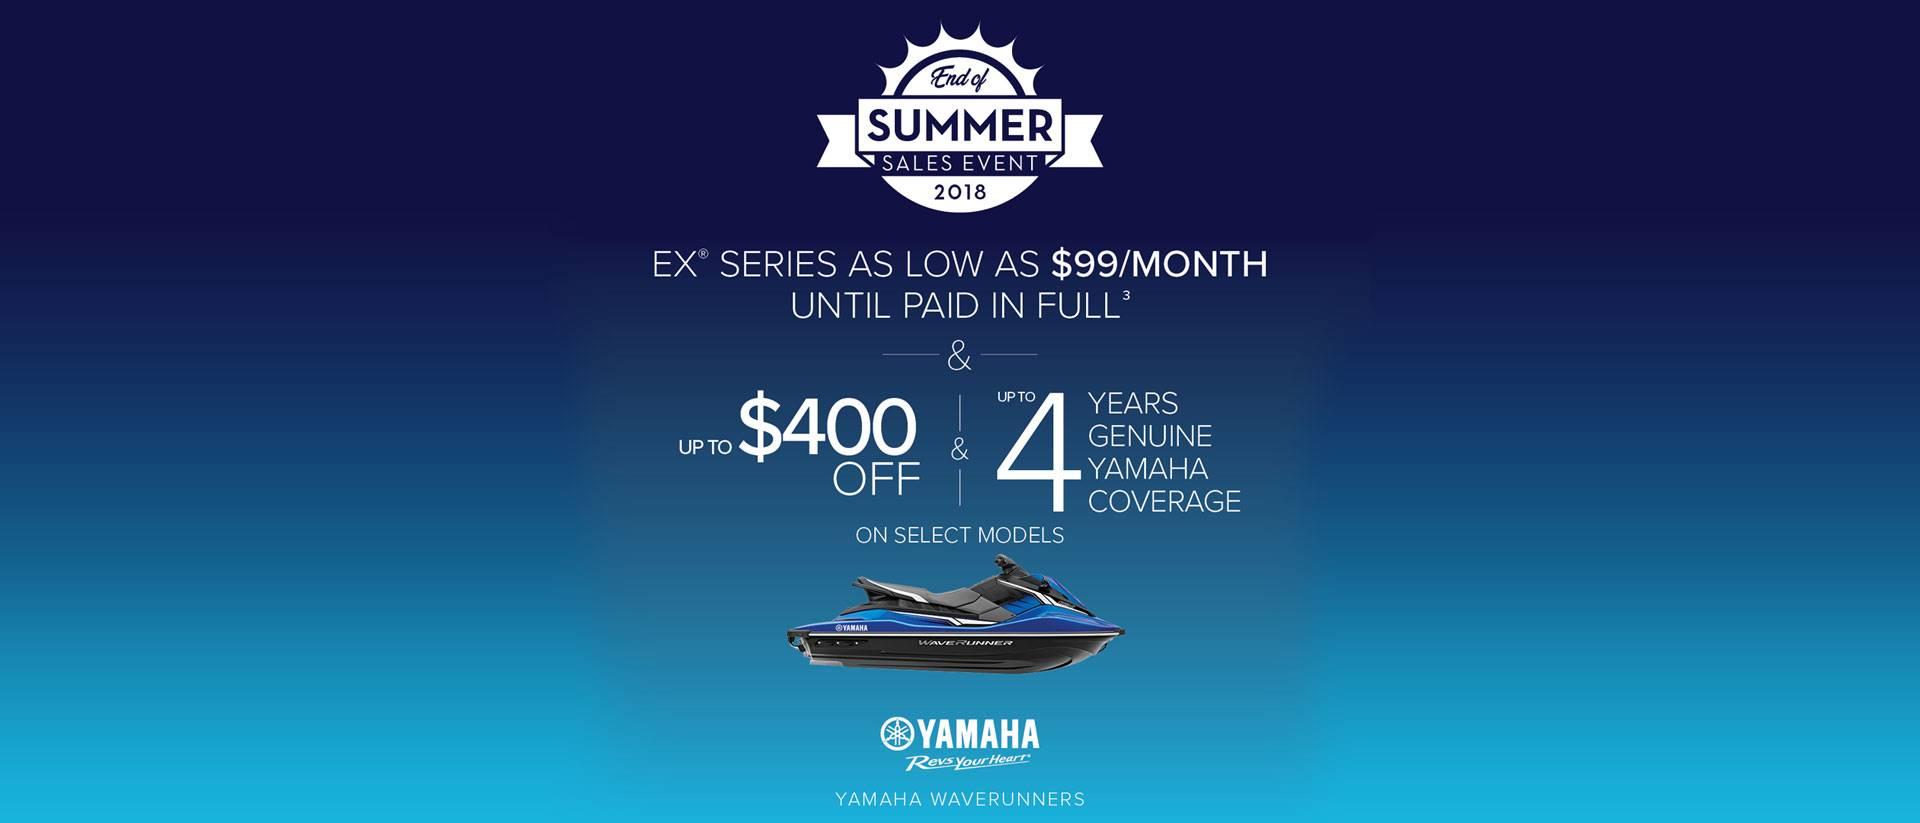 Yamaha Waverunners - EX Series - $99 per month